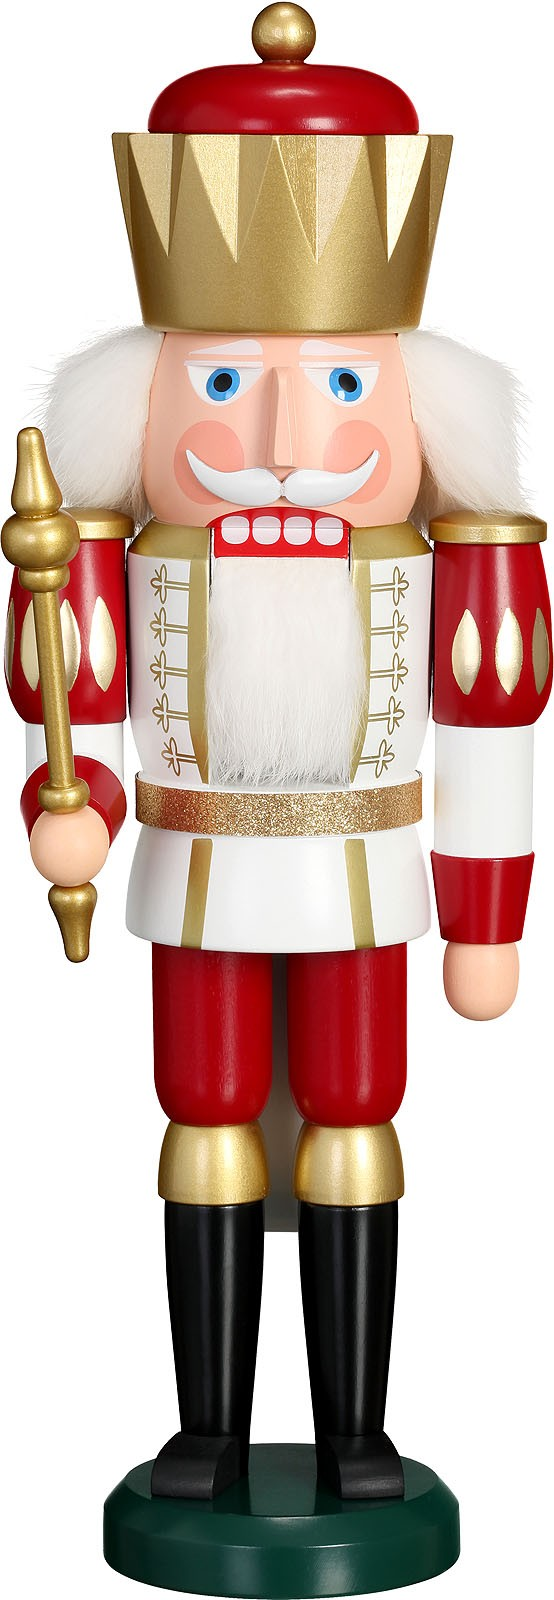 Nussknacker König, weiß-rot